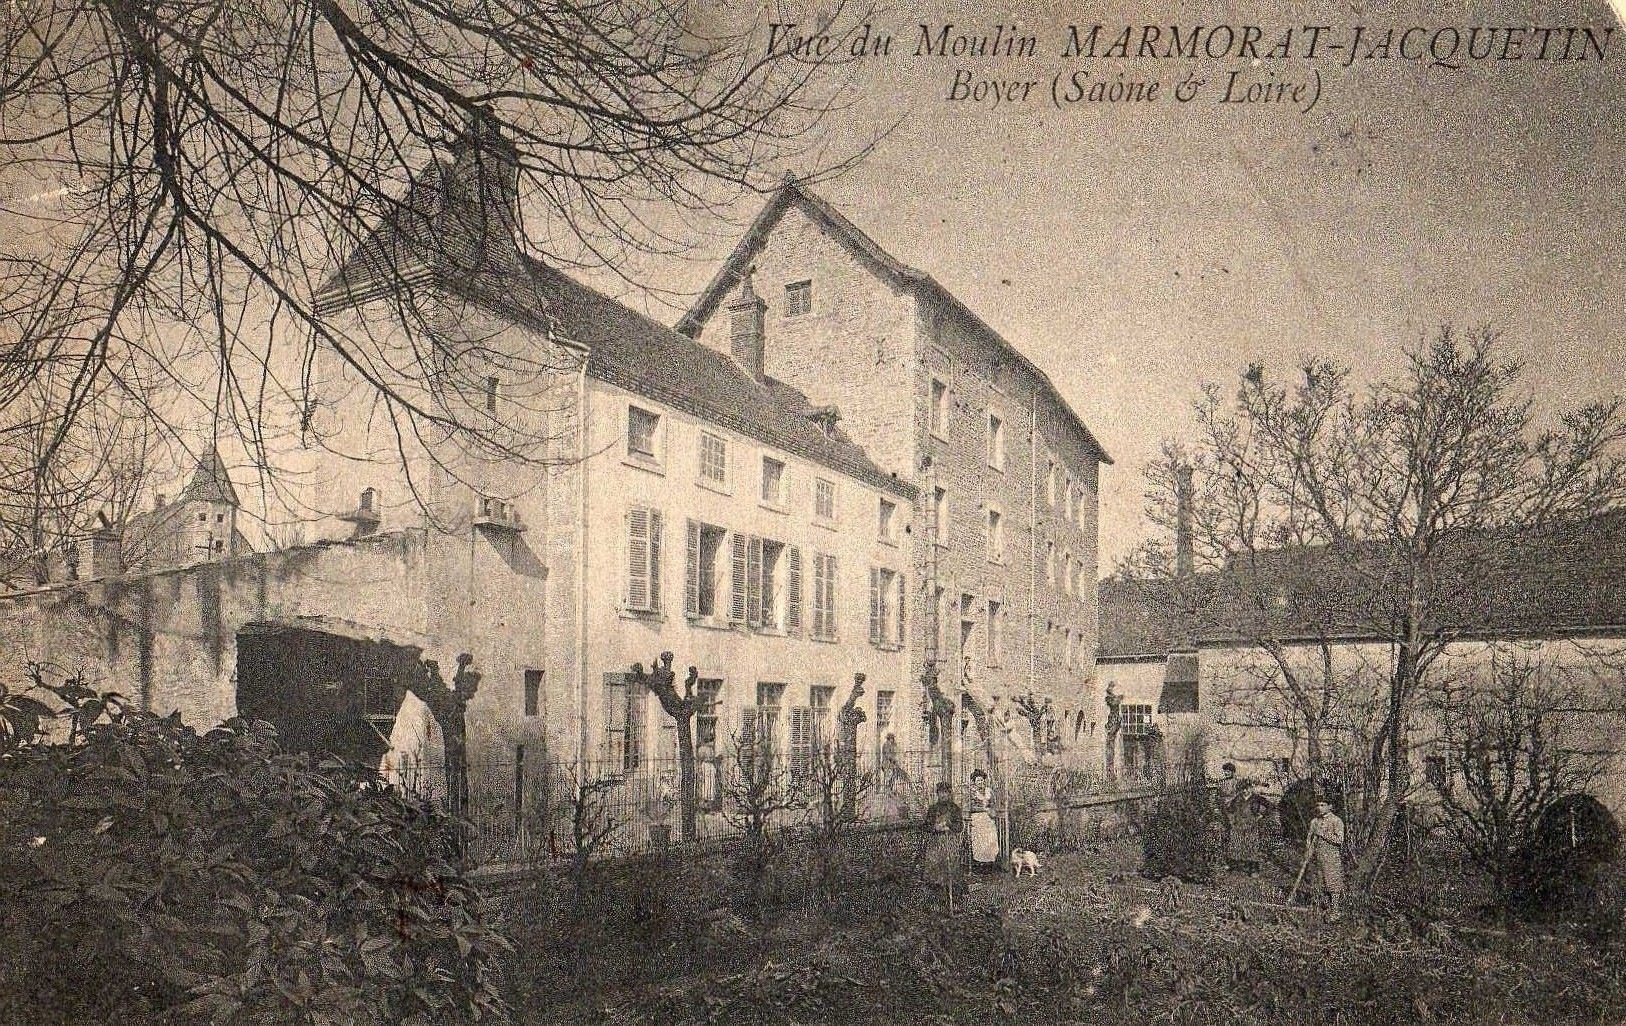 Moulin Girard Marmorat-jacquetin Boyer